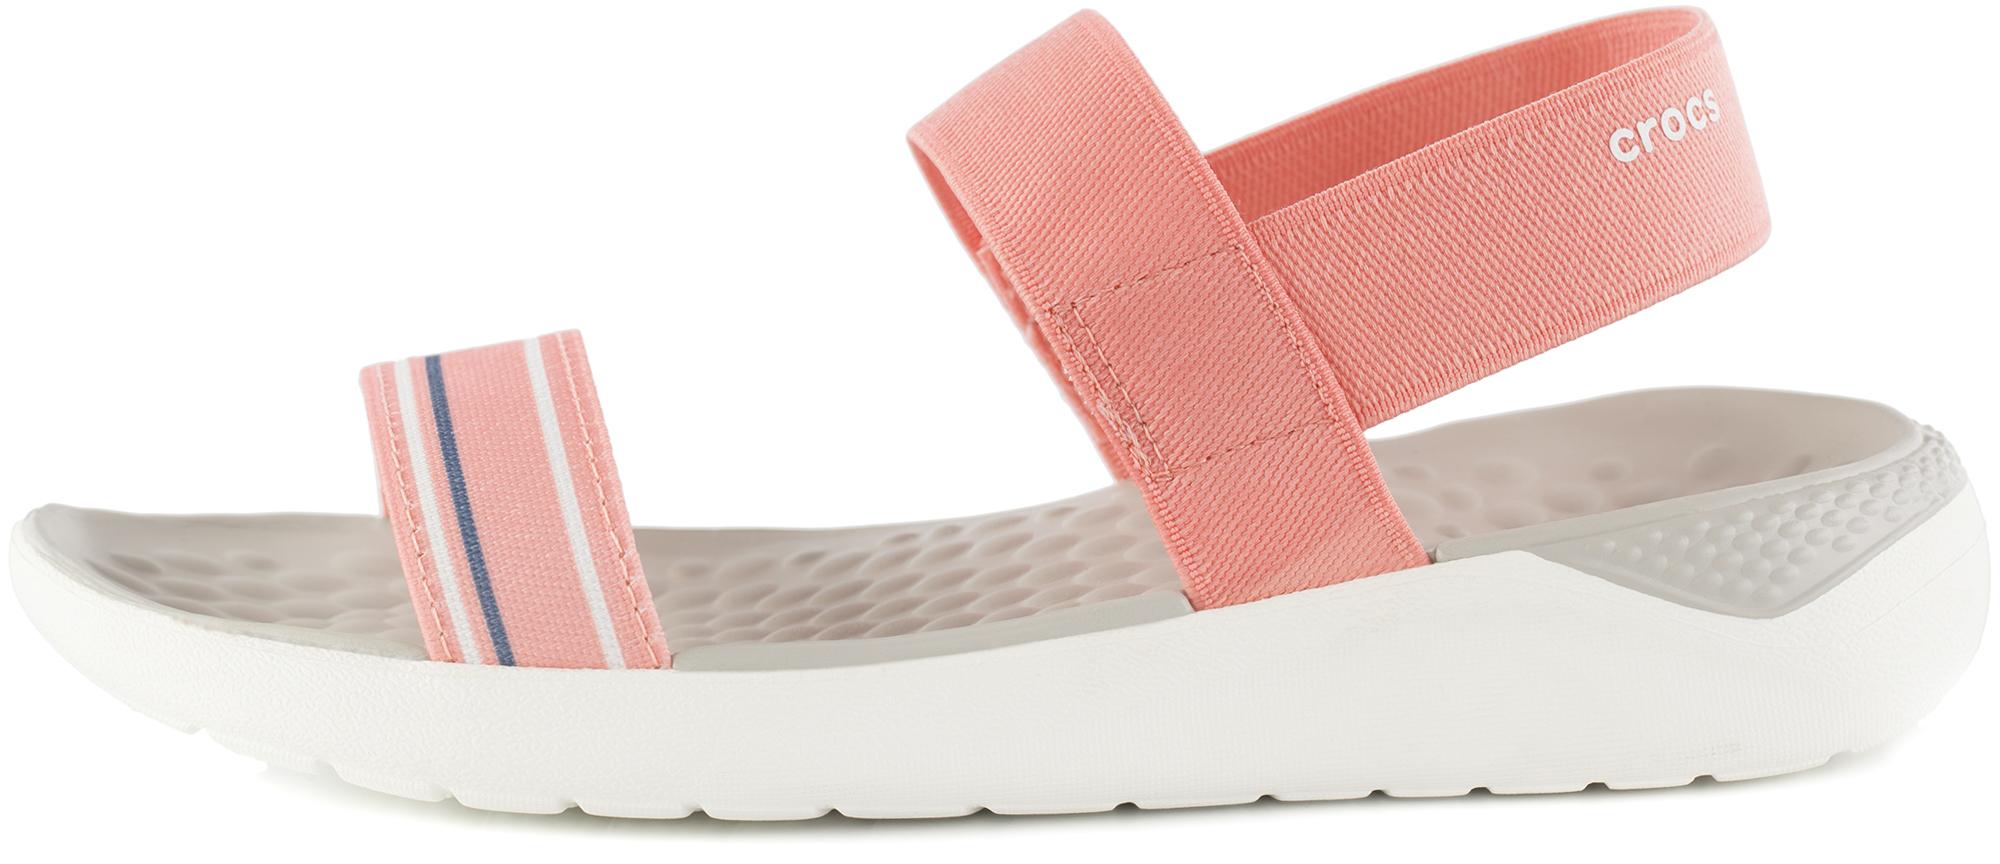 Crocs Сандалии женские Crocs LiteRide, размер 40 цены онлайн